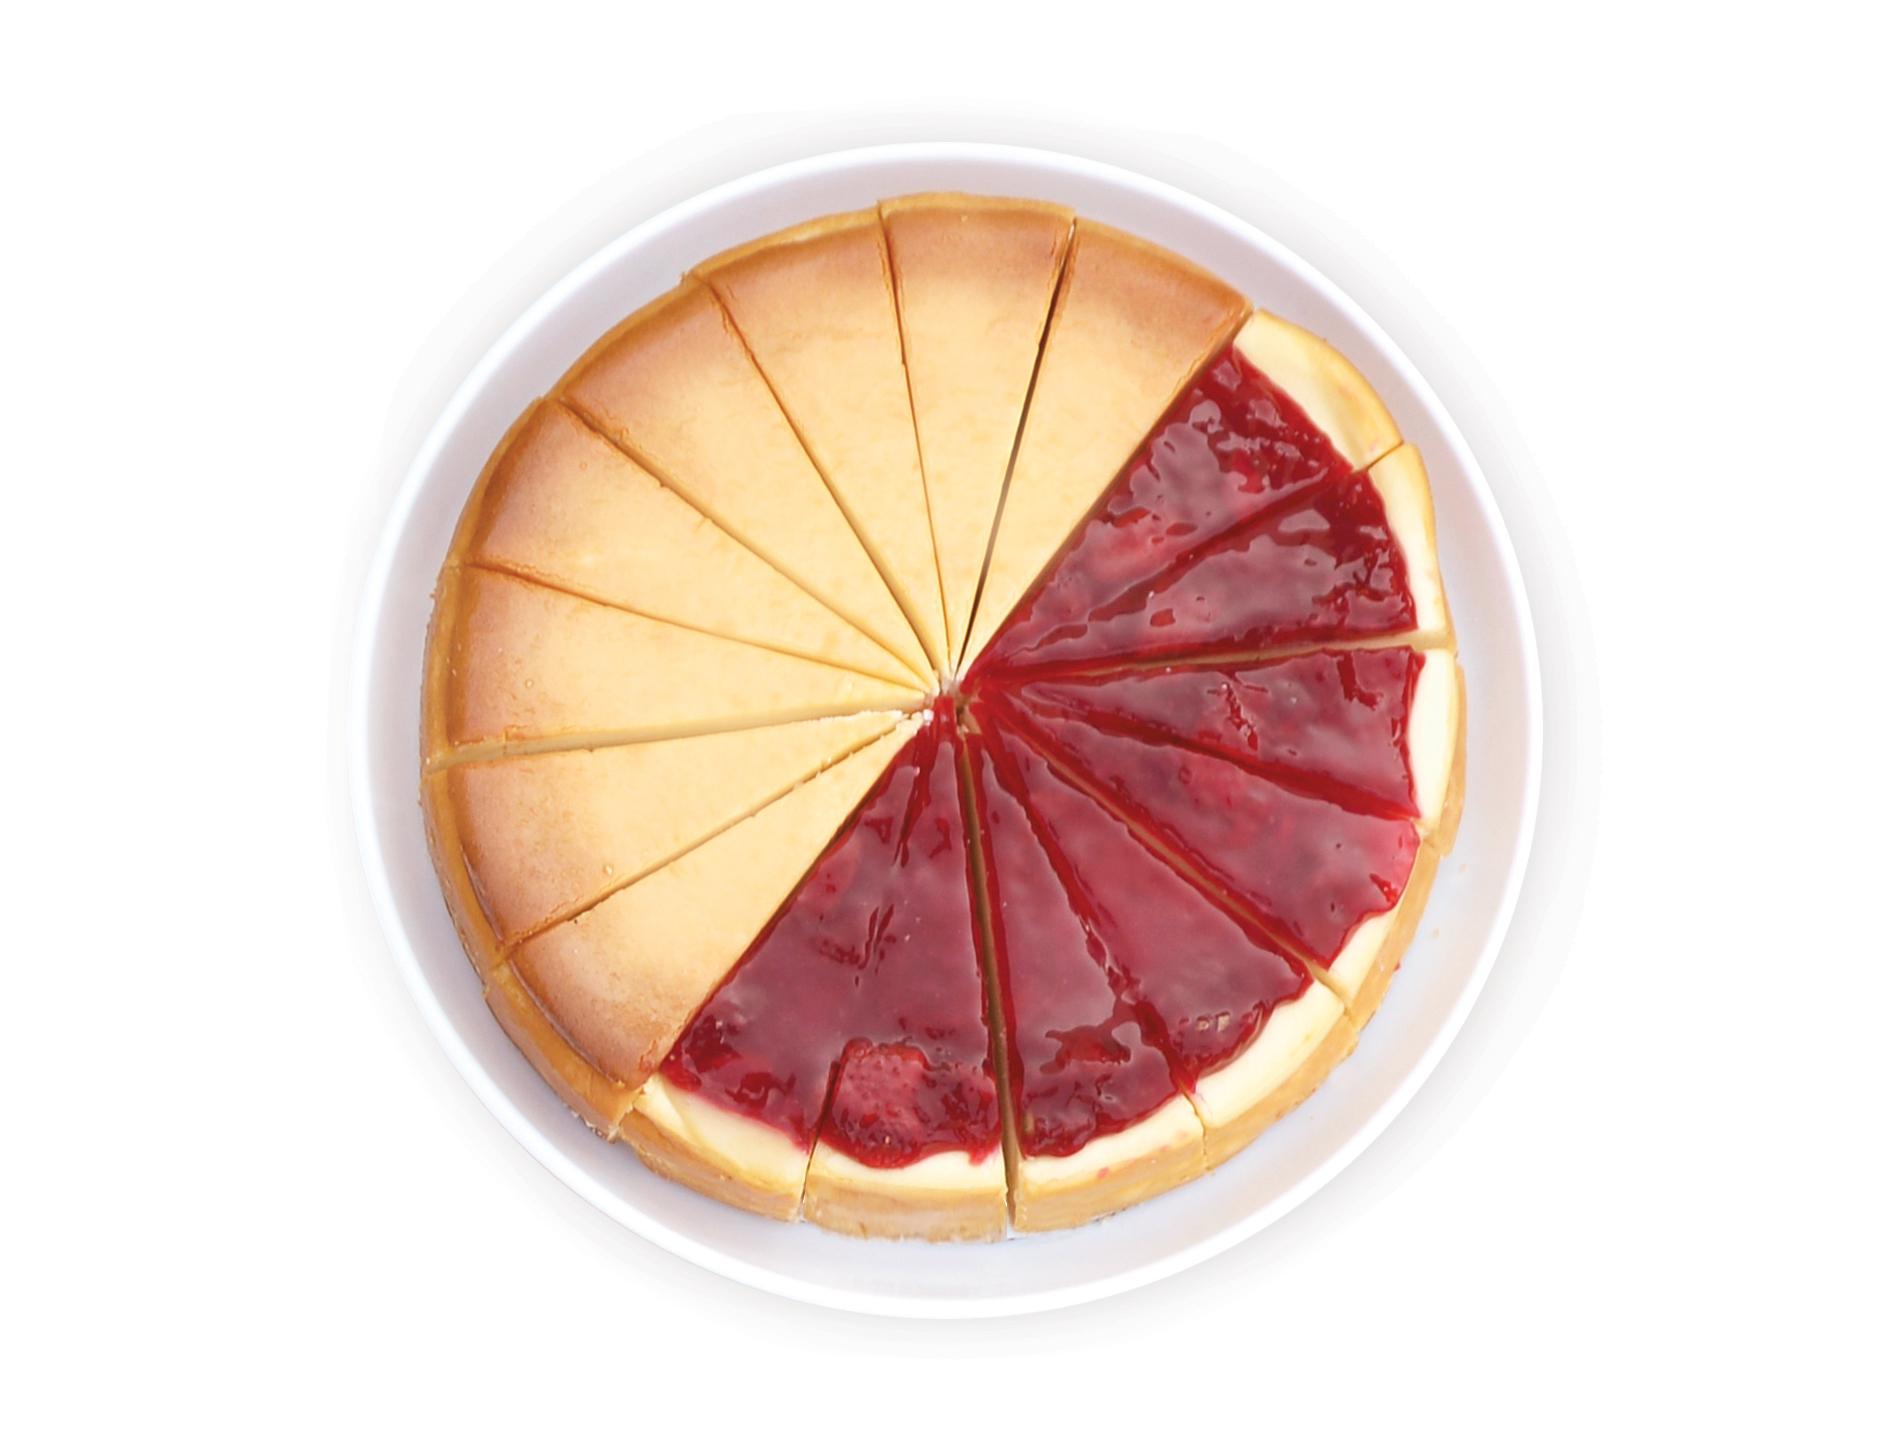 Half & Half Sampler - Plain and Strawberry